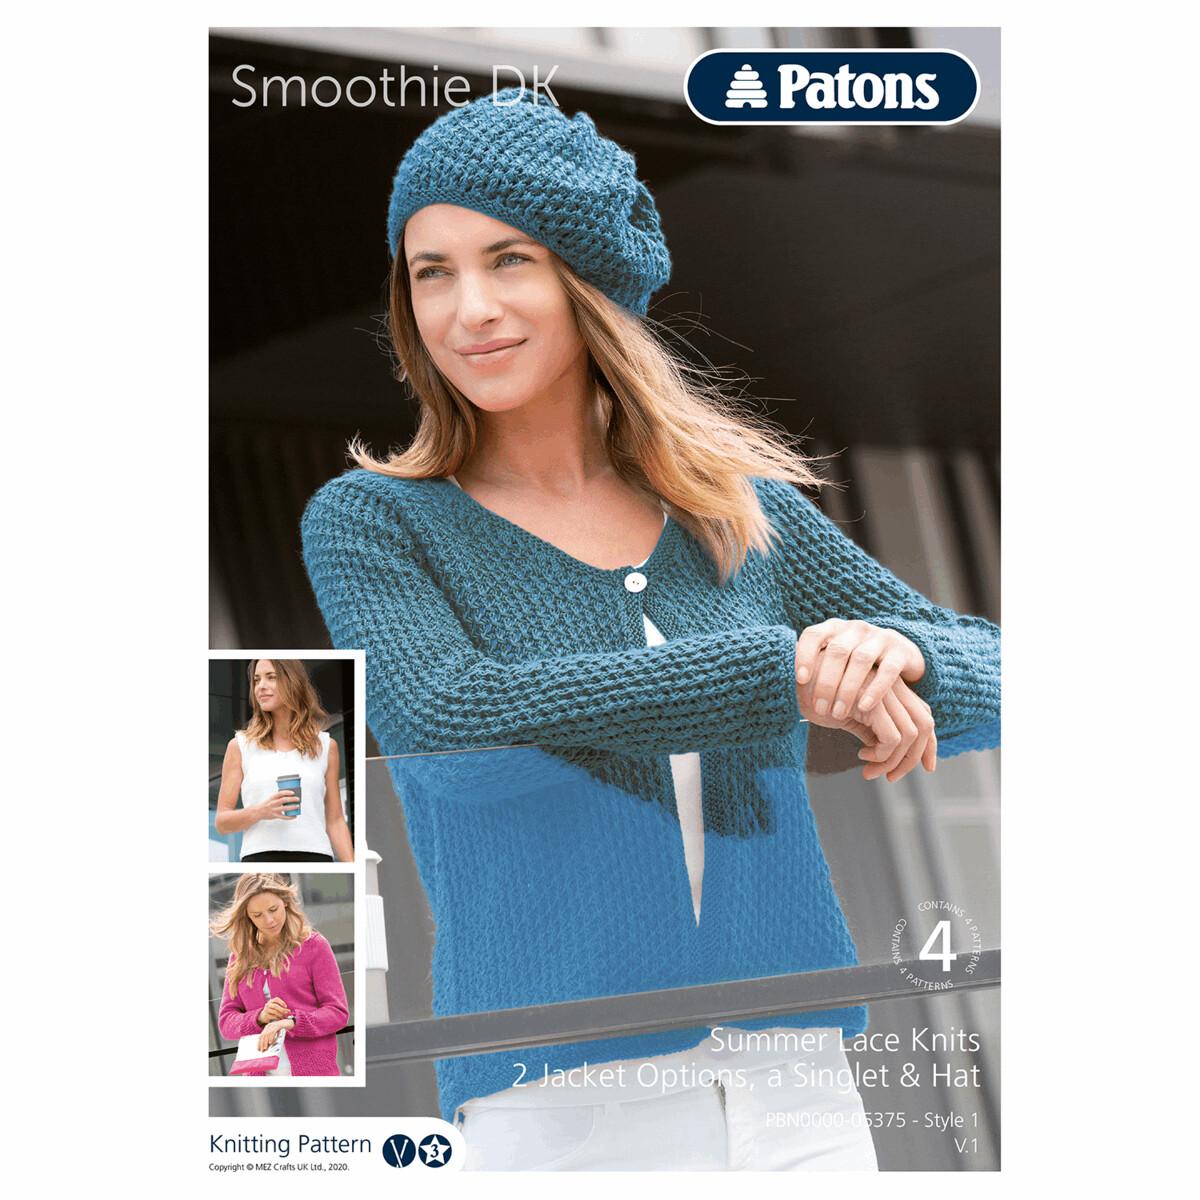 Smoothie DK: Ladies Wear by Patons